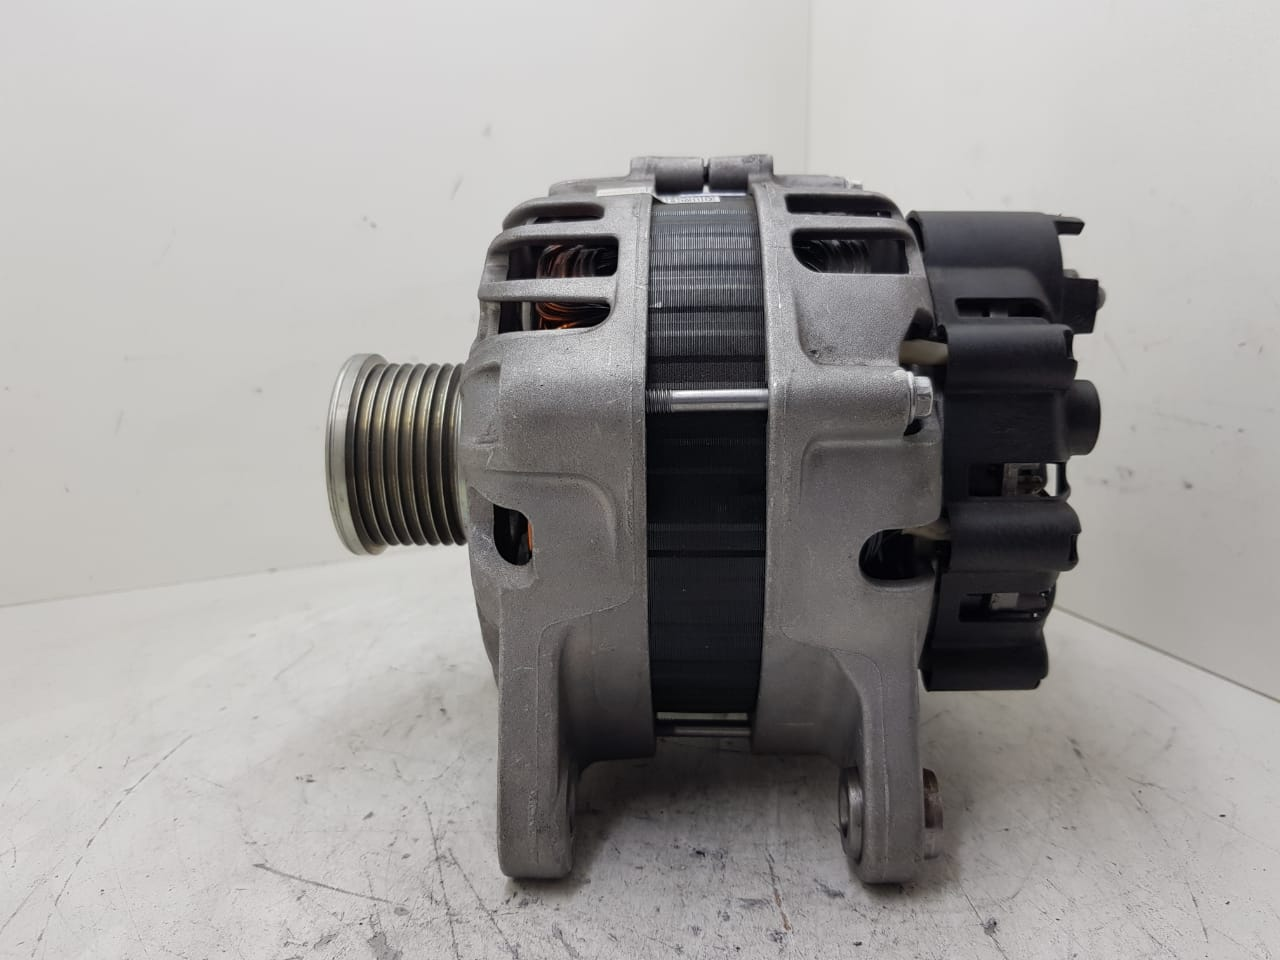 Alternador 12v 110a Renault Captur Duster 2.0 16v Oroch 2.0 231001017R TG12C259 2712661 TG12C259 27817 A175509 231001017R TG12S326 2721984 12719 A190388 231002418R TG12S326 2721984 12719 A190388